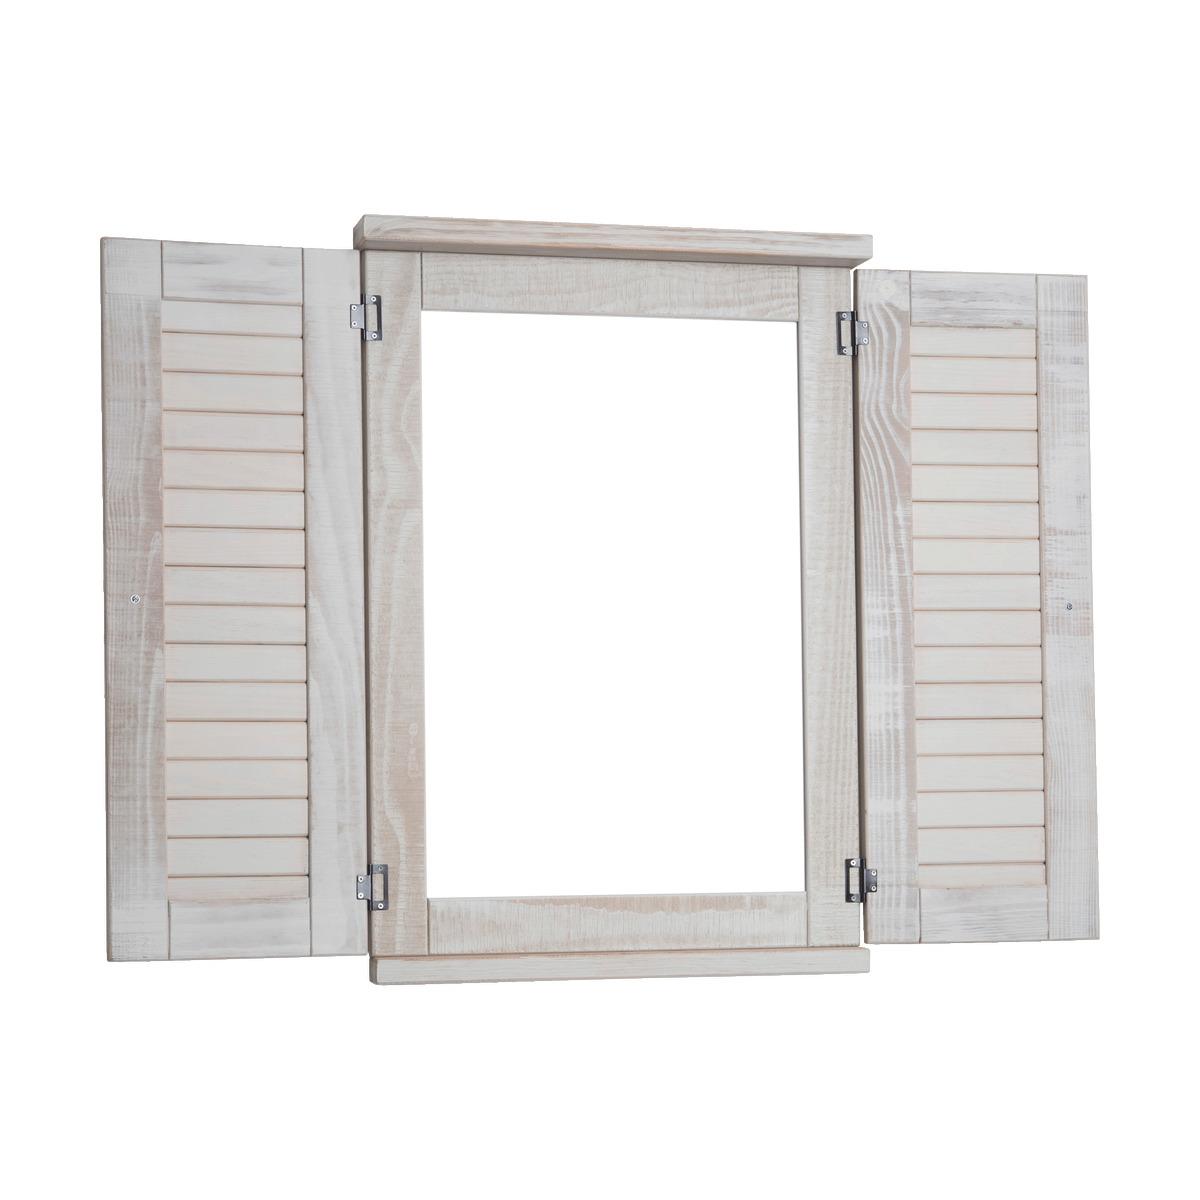 Miroir Rectangulaire Fenetre En Pin Brosse Blanc Alinea Miroir Rectangulaire Miroir Et Persienne